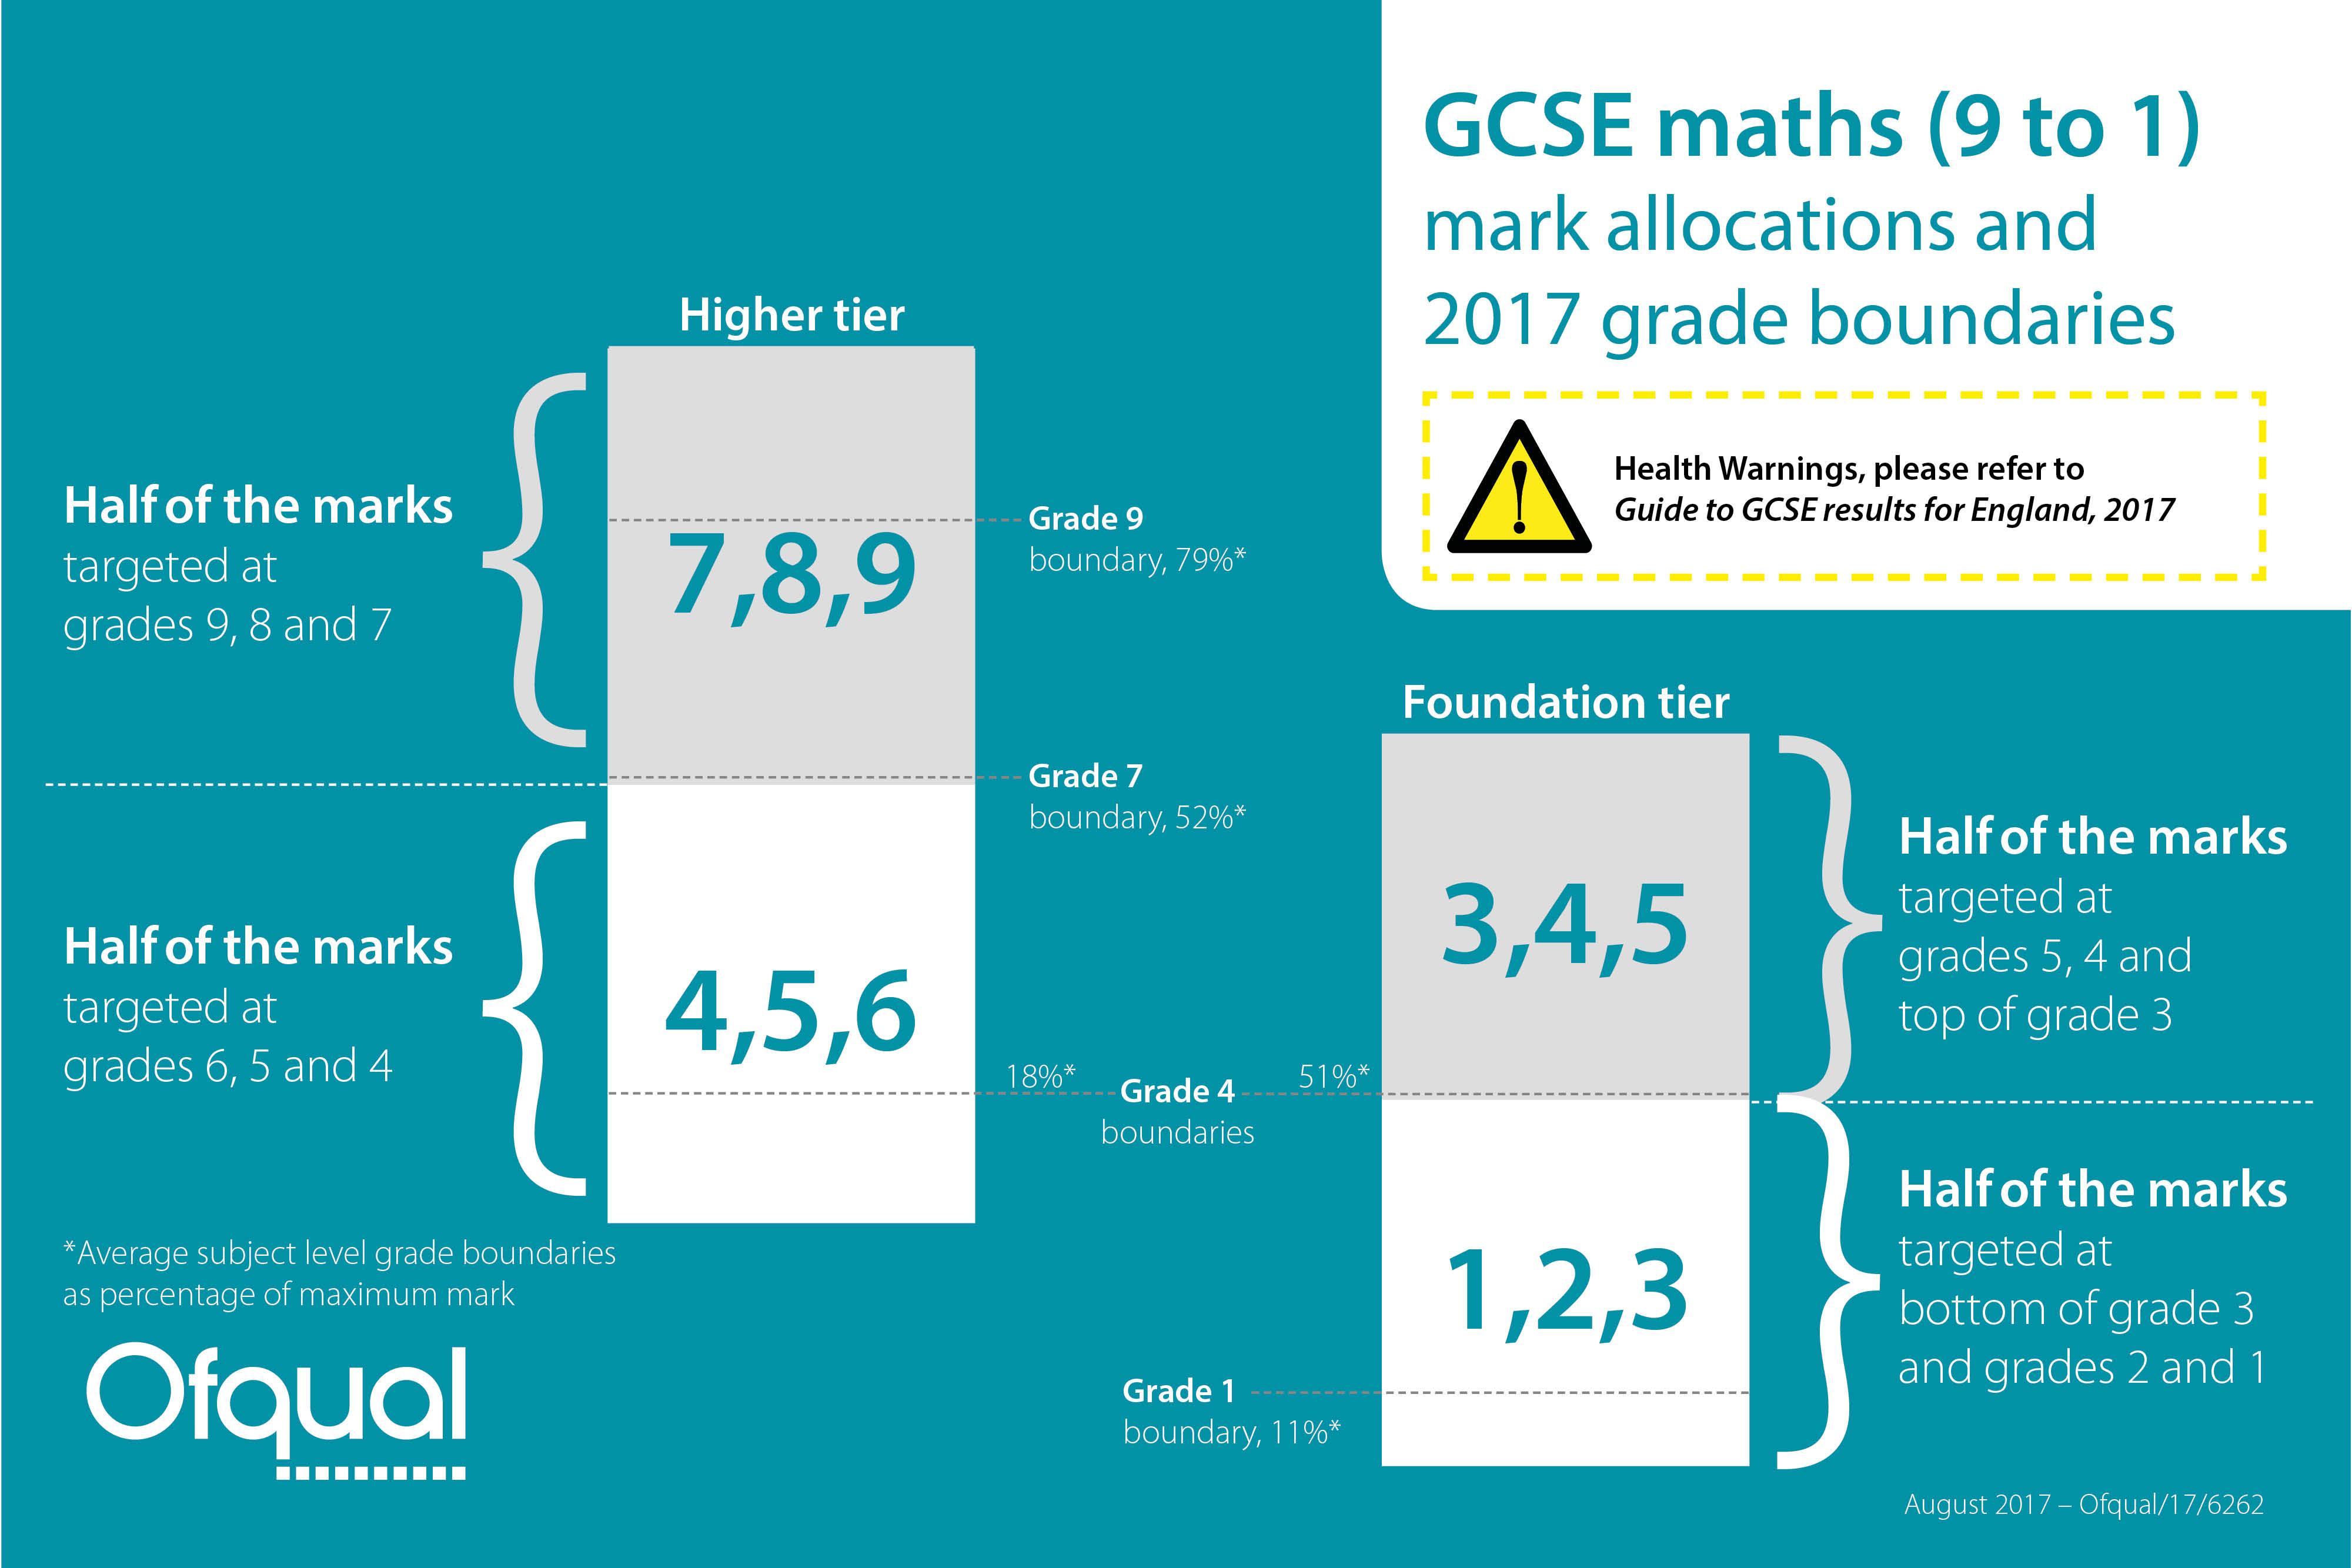 GCSE maths grade boundaries - The Ofqual blog